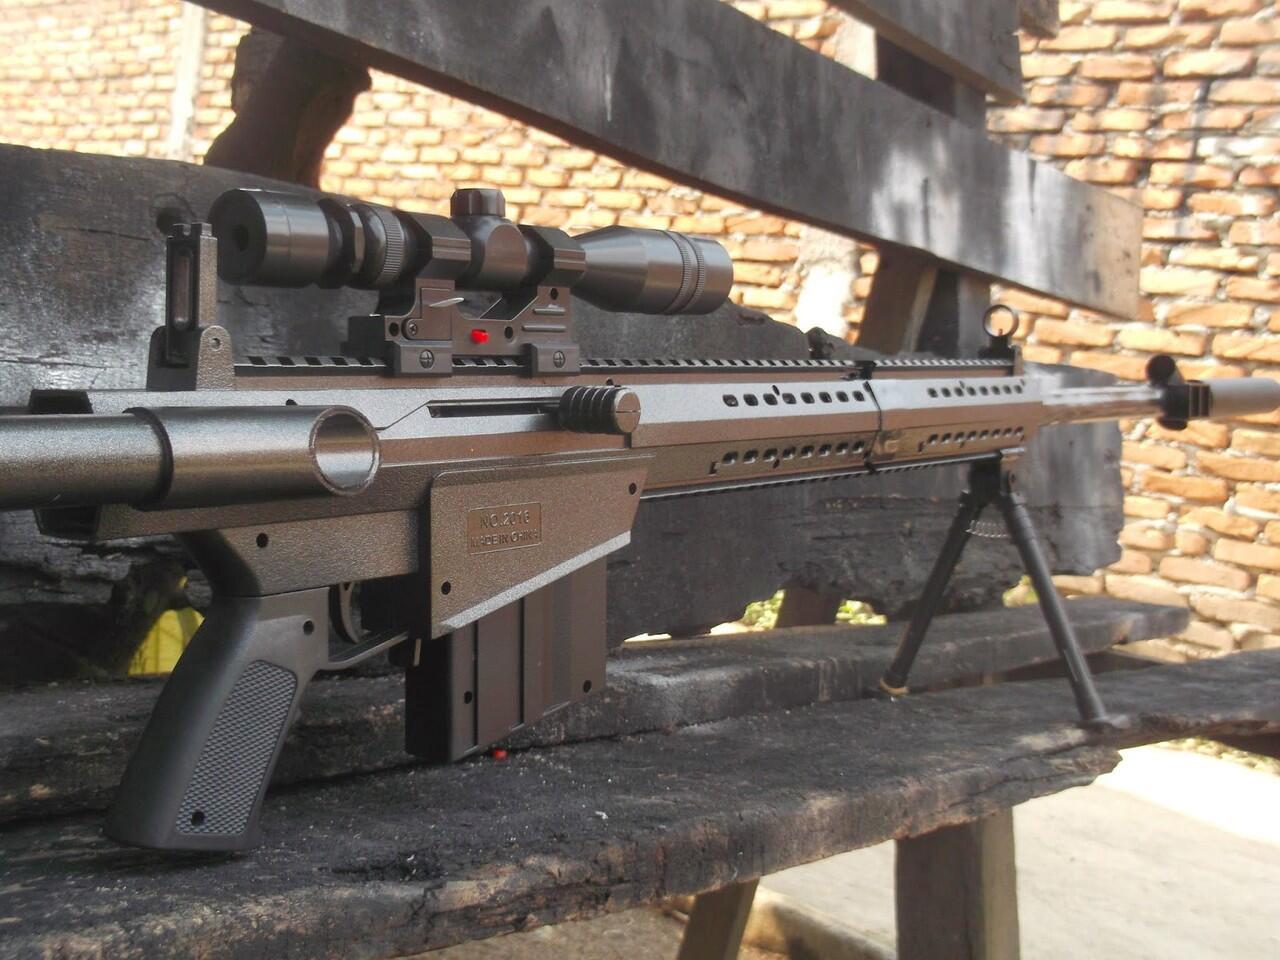 magnum sniper pitmaker - HD1280×960